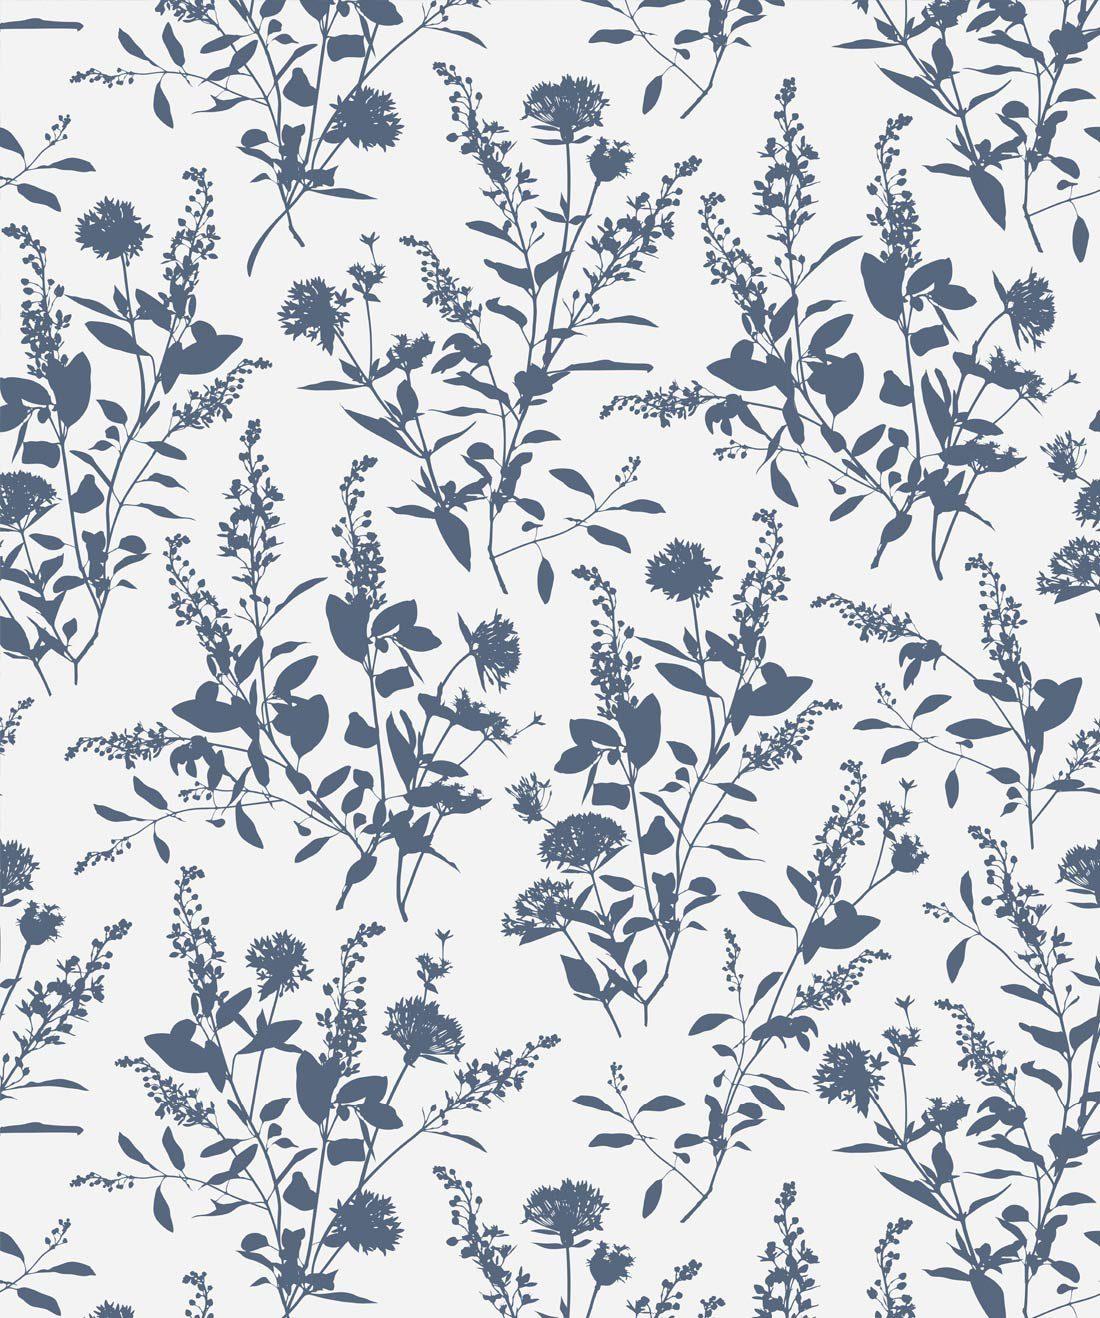 Wildflowers An Exotic Bouquet Designer Wallpaper Milton King